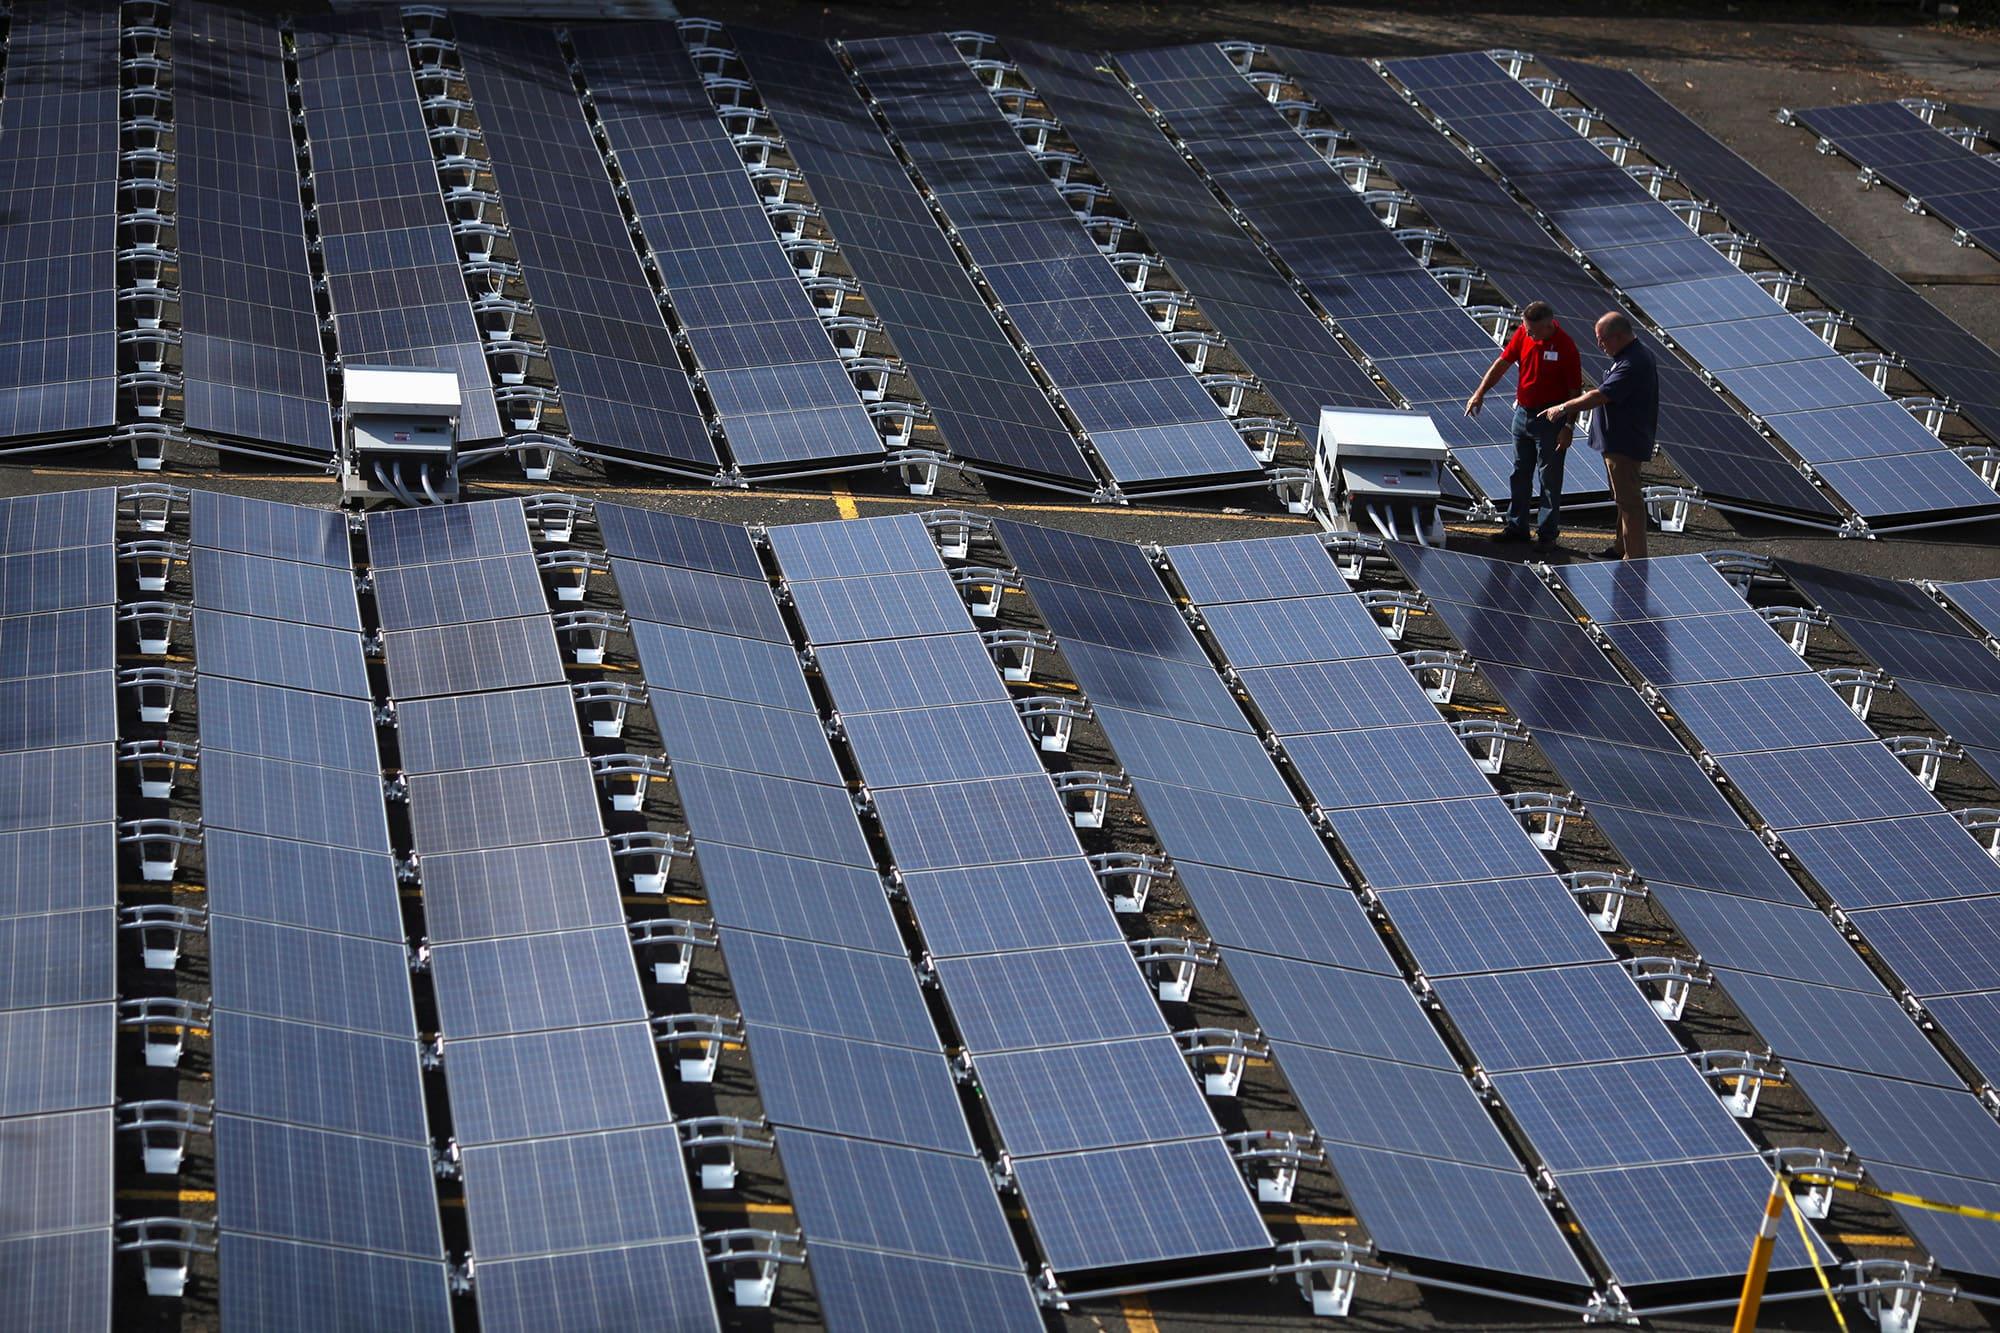 Tesla to close a dozen solar facilities in 9 states: Documents